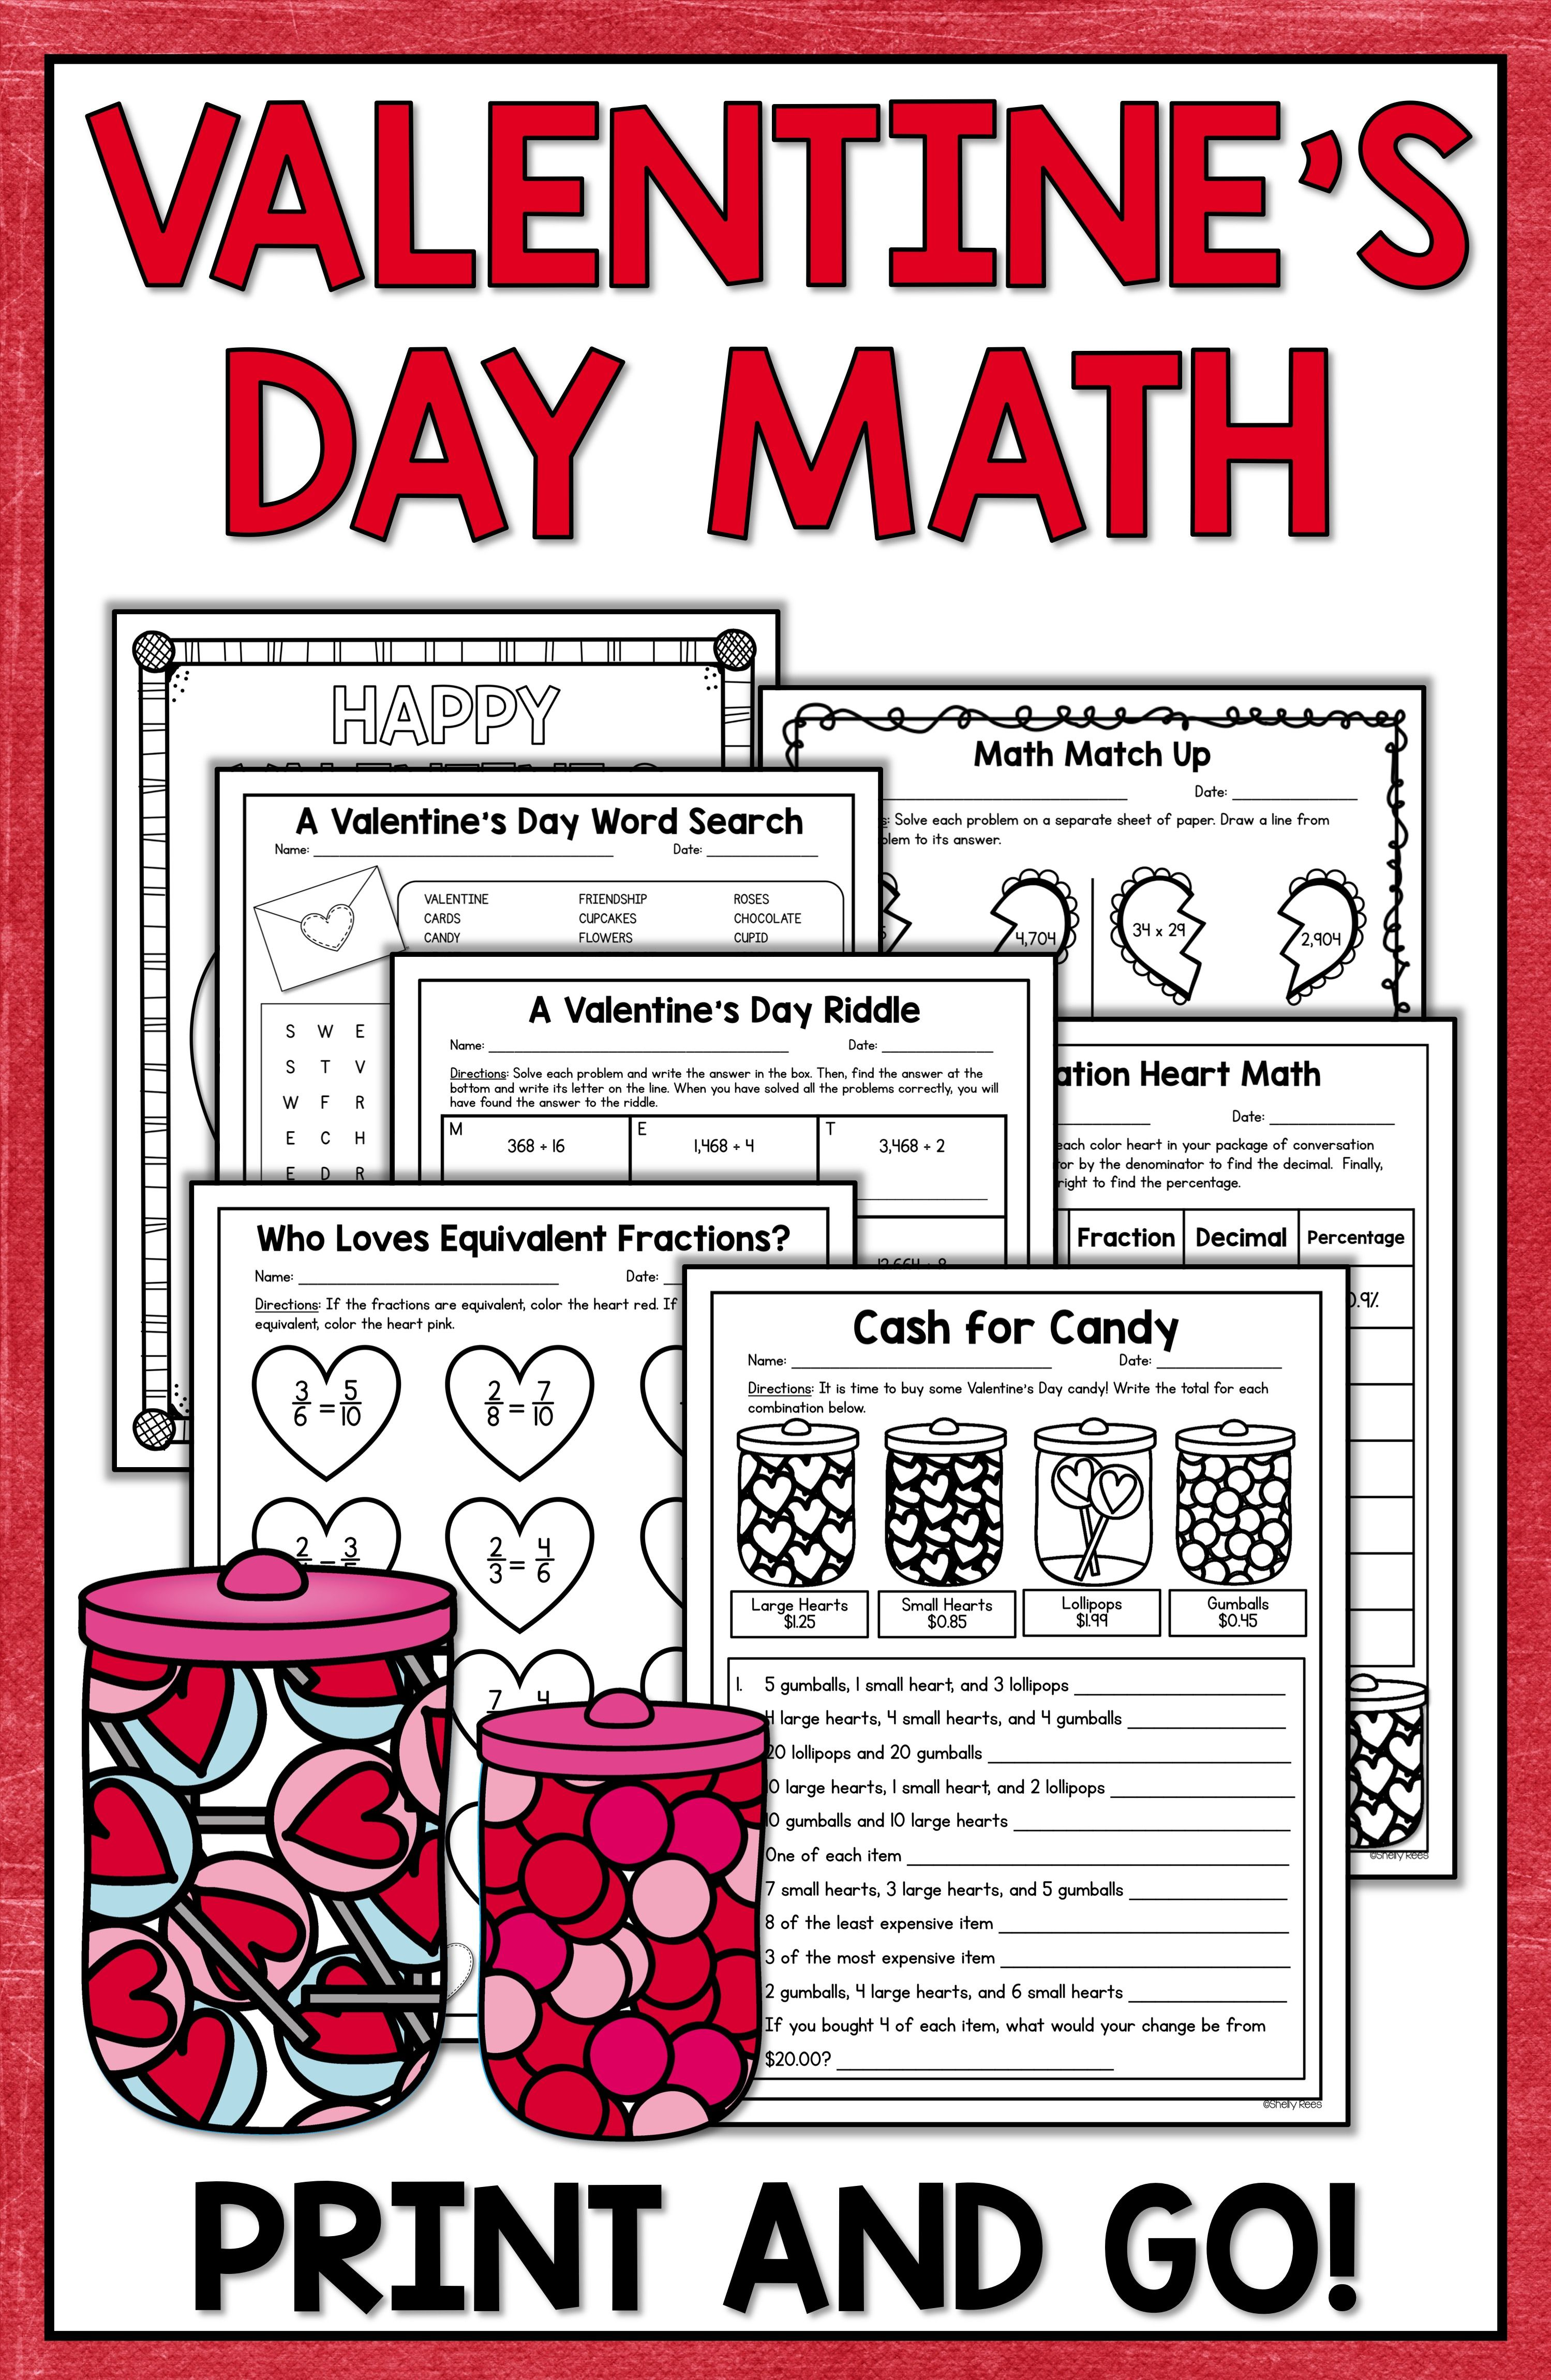 hight resolution of Valentine's Day Math - Valentine's Day Activities   Math valentines